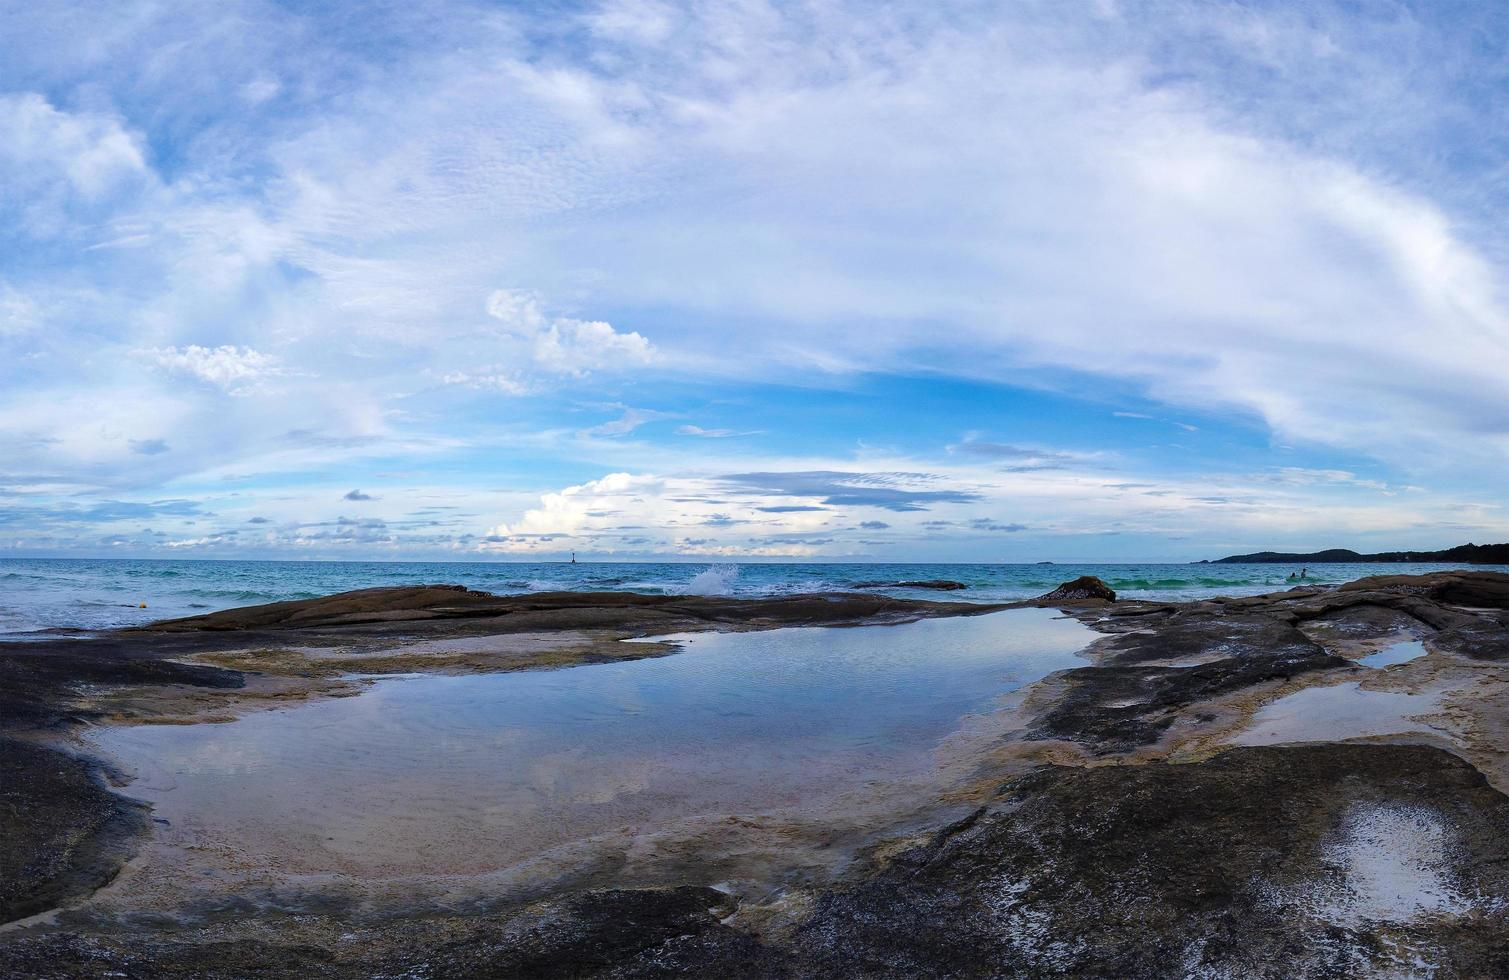 panorama da costa rochosa foto